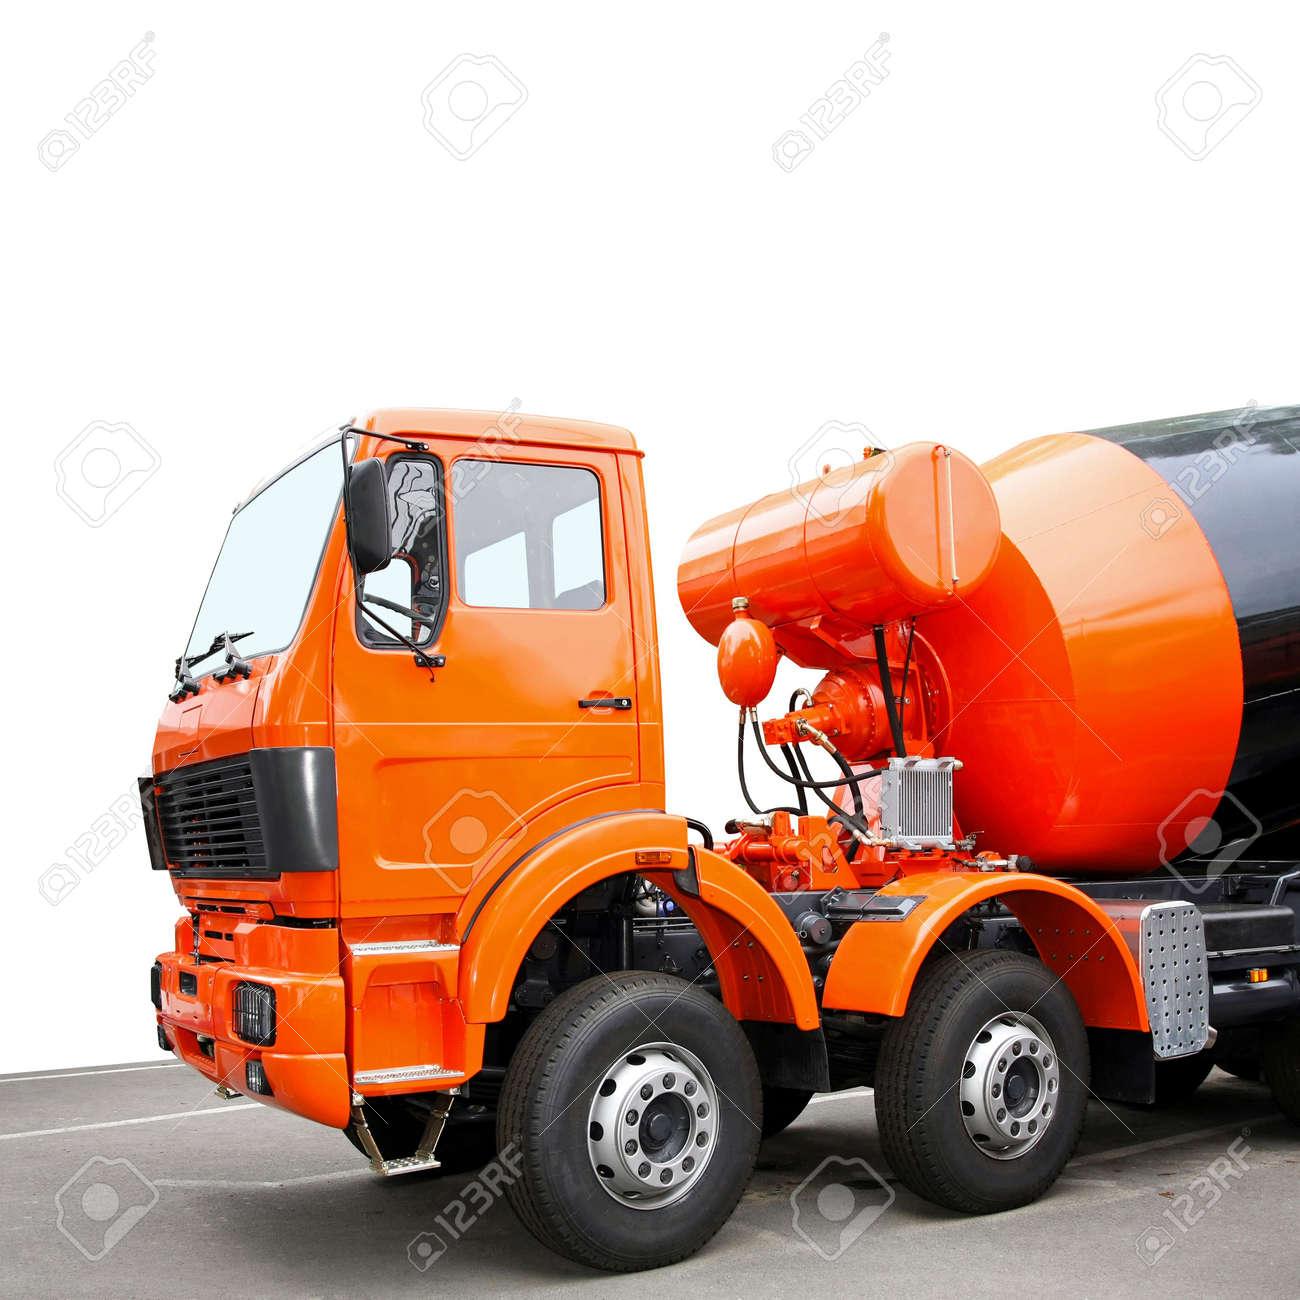 Orange Cement Mixer Front View of Orange Cement